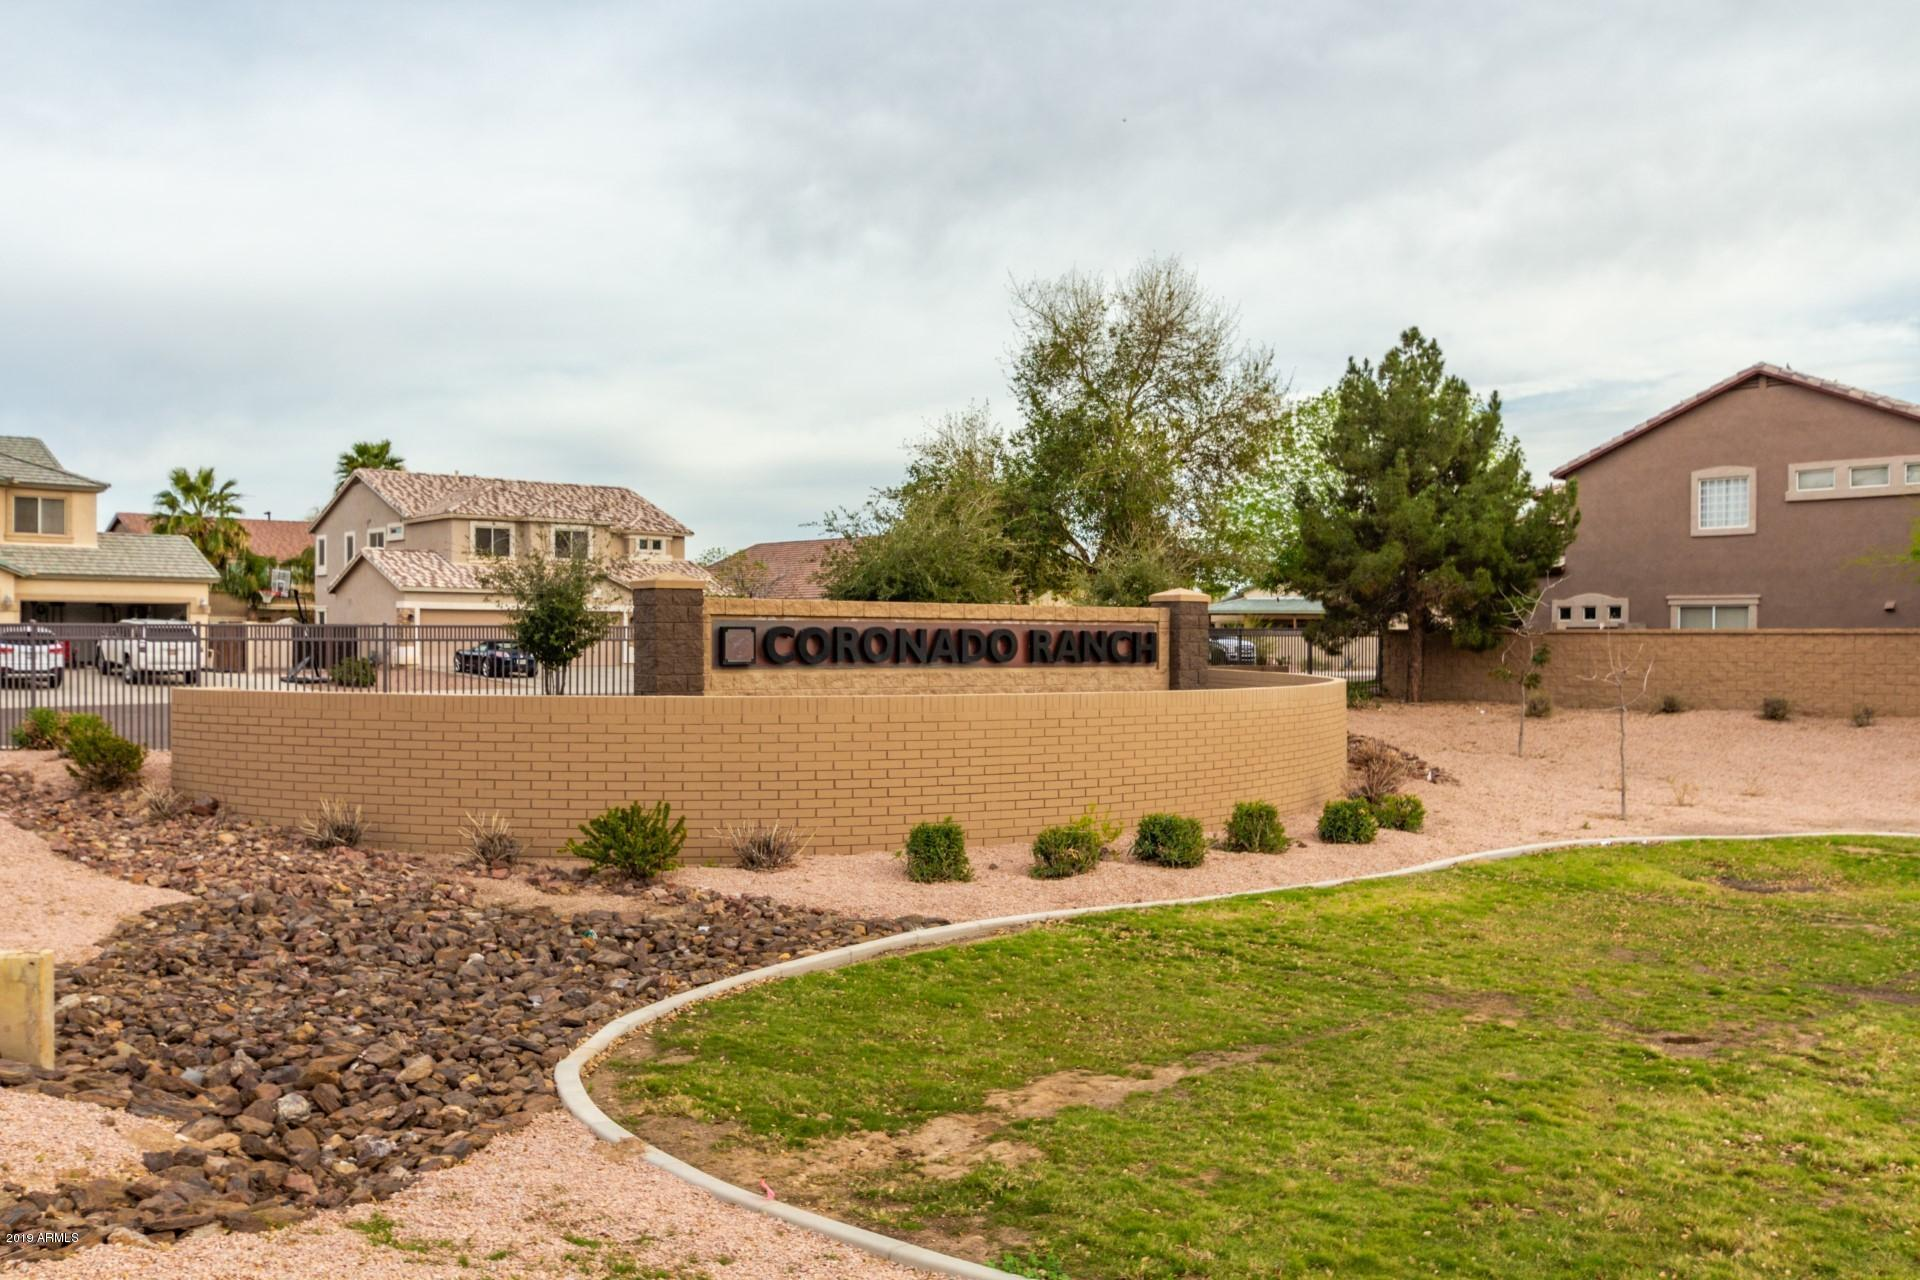 MLS 5928734 3954 E WATEKA Court, Gilbert, AZ 85297 Gilbert AZ Coronado Ranch